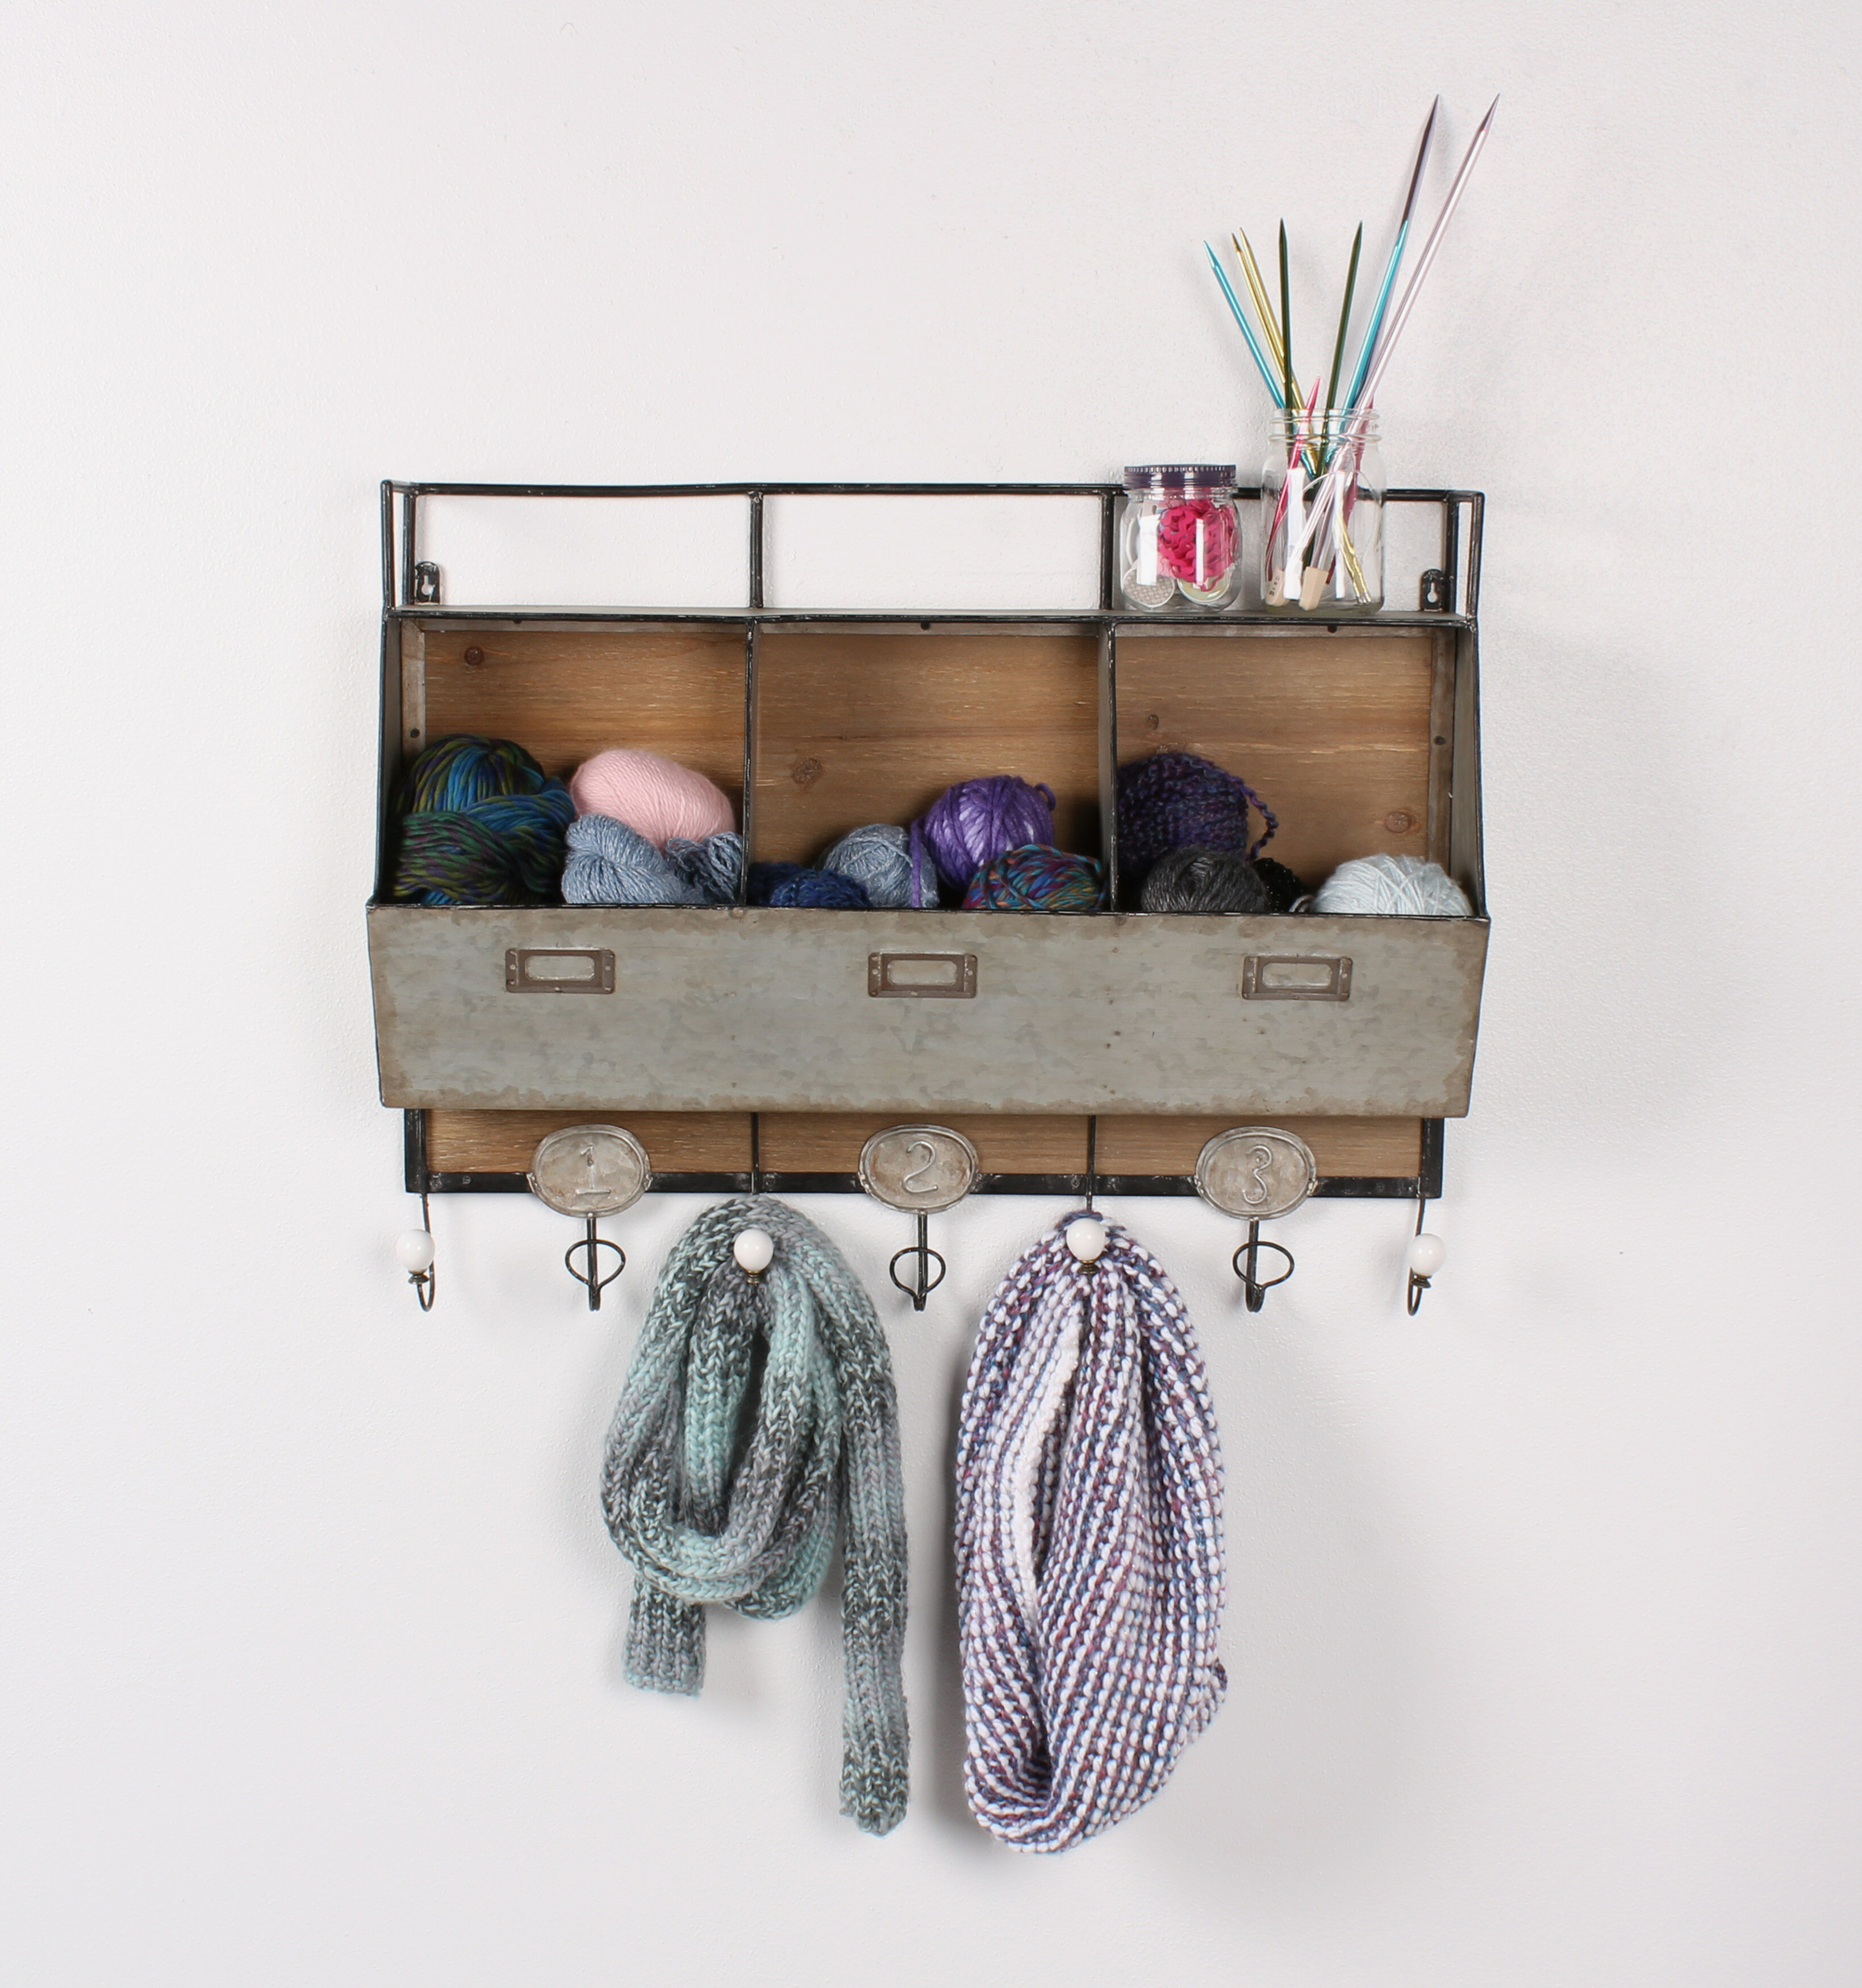 DSOV Arnica Rustic Wood And Metal Wall Storage Pockets With Coat Rack Hooks  U0026 Reviews | Wayfair